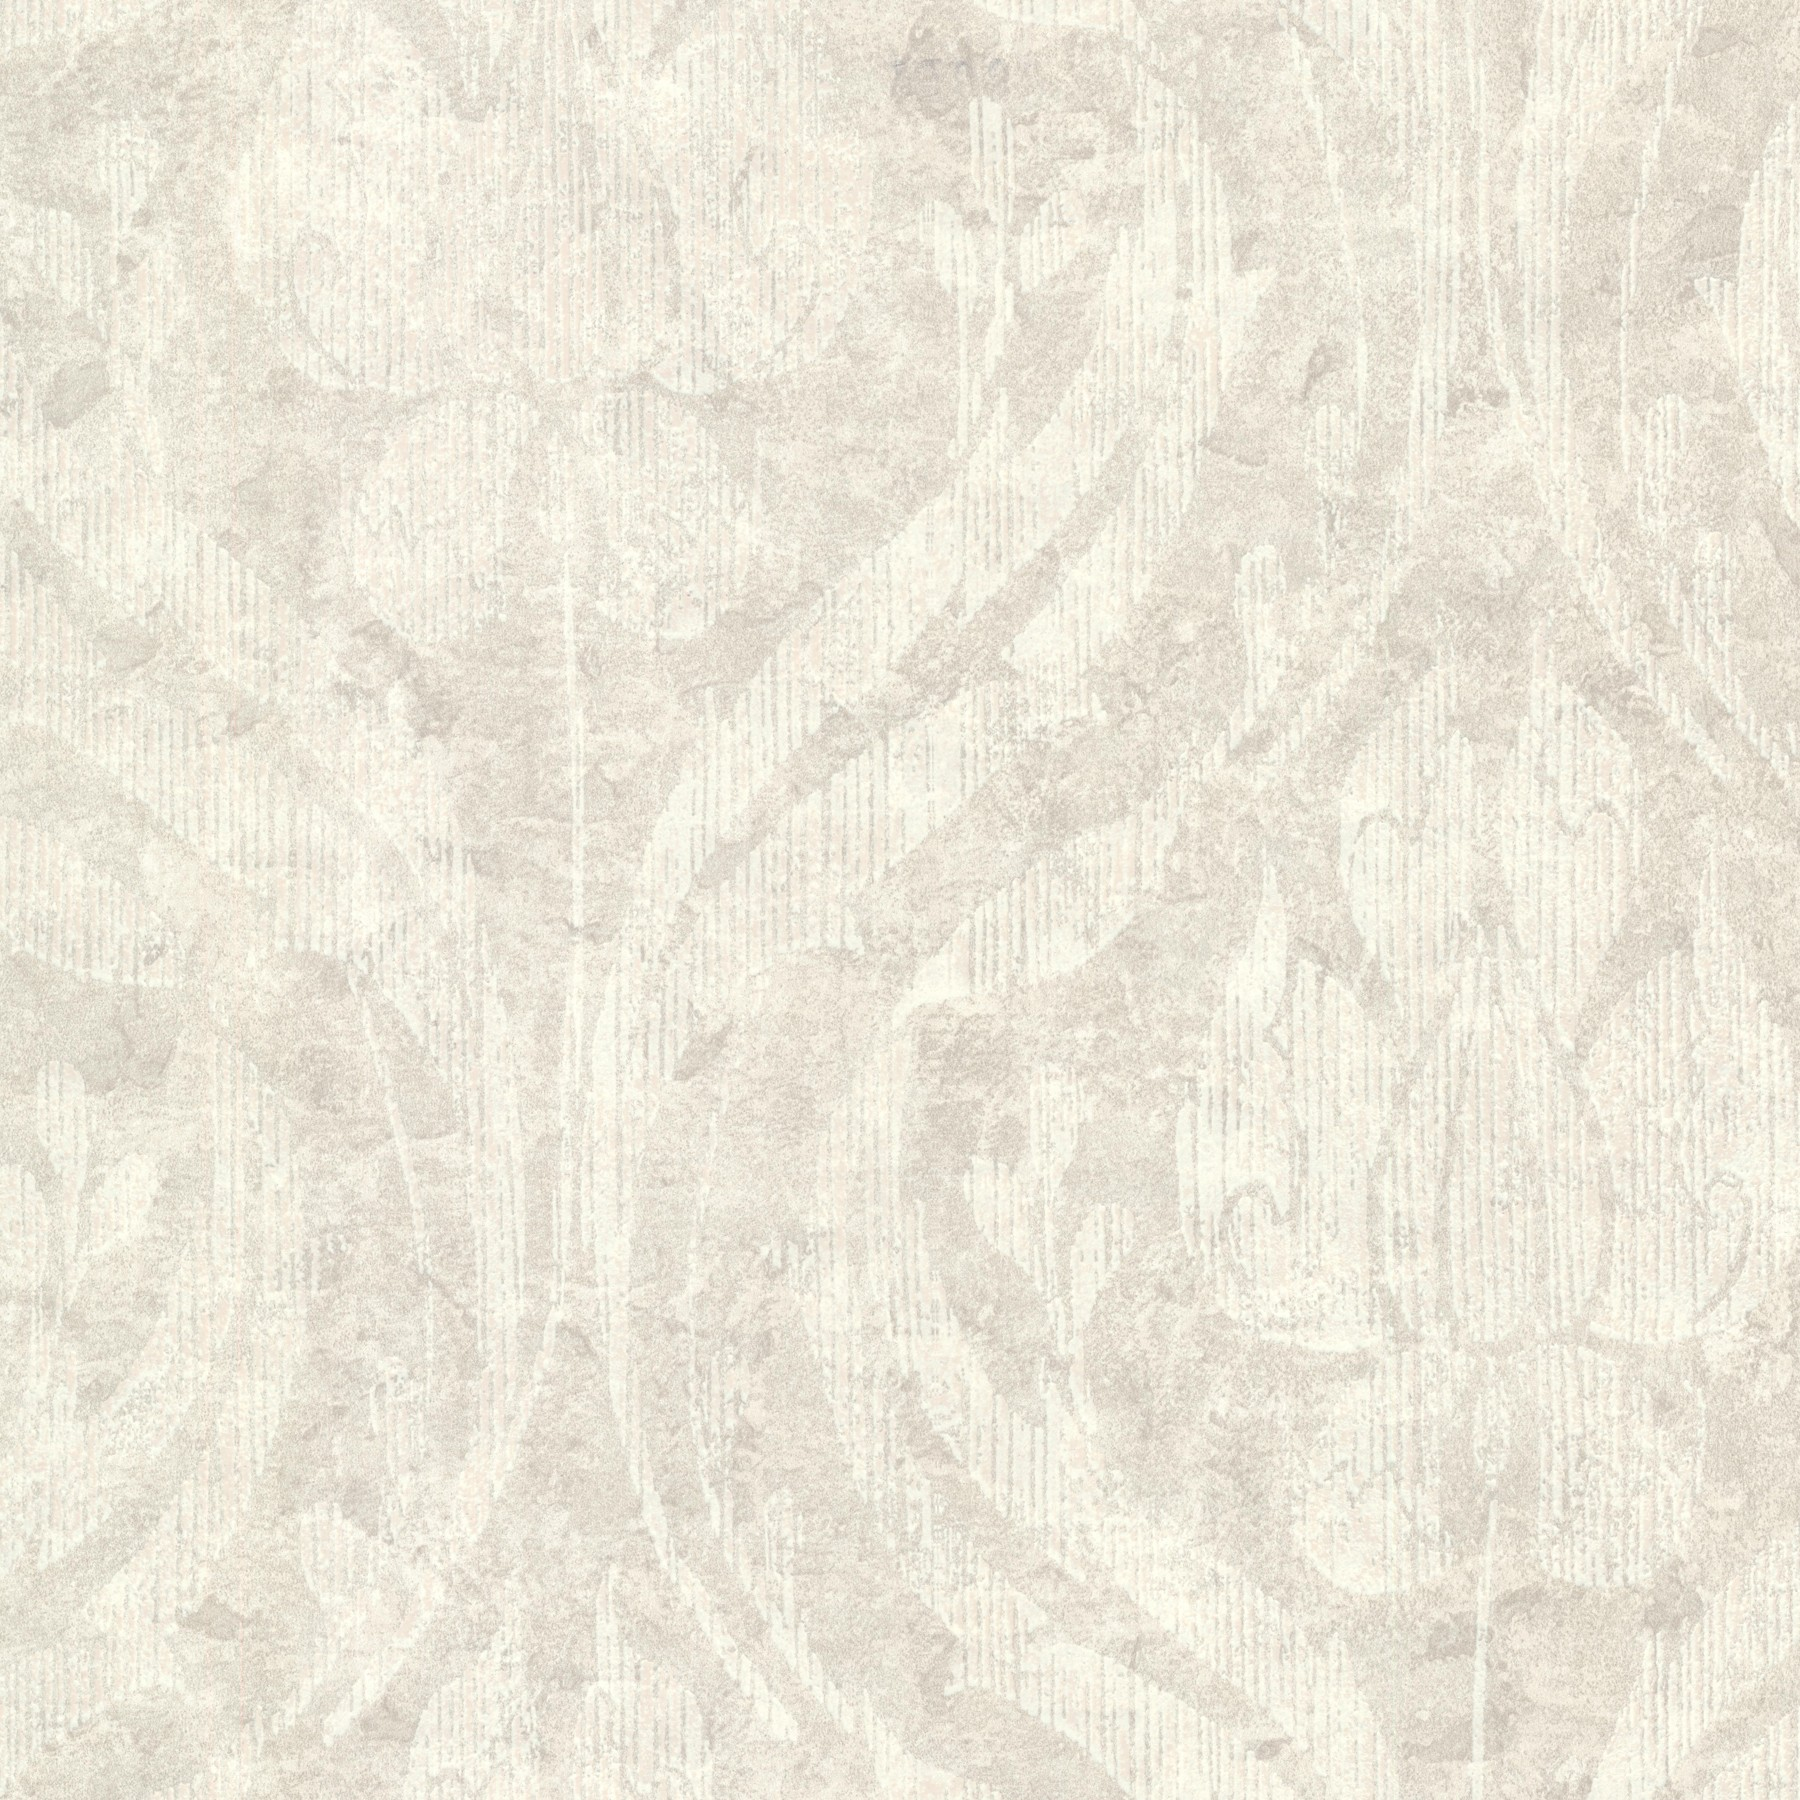 Tapete Onyx Vliestapete Rasch Textil 020034 Barock beige ...